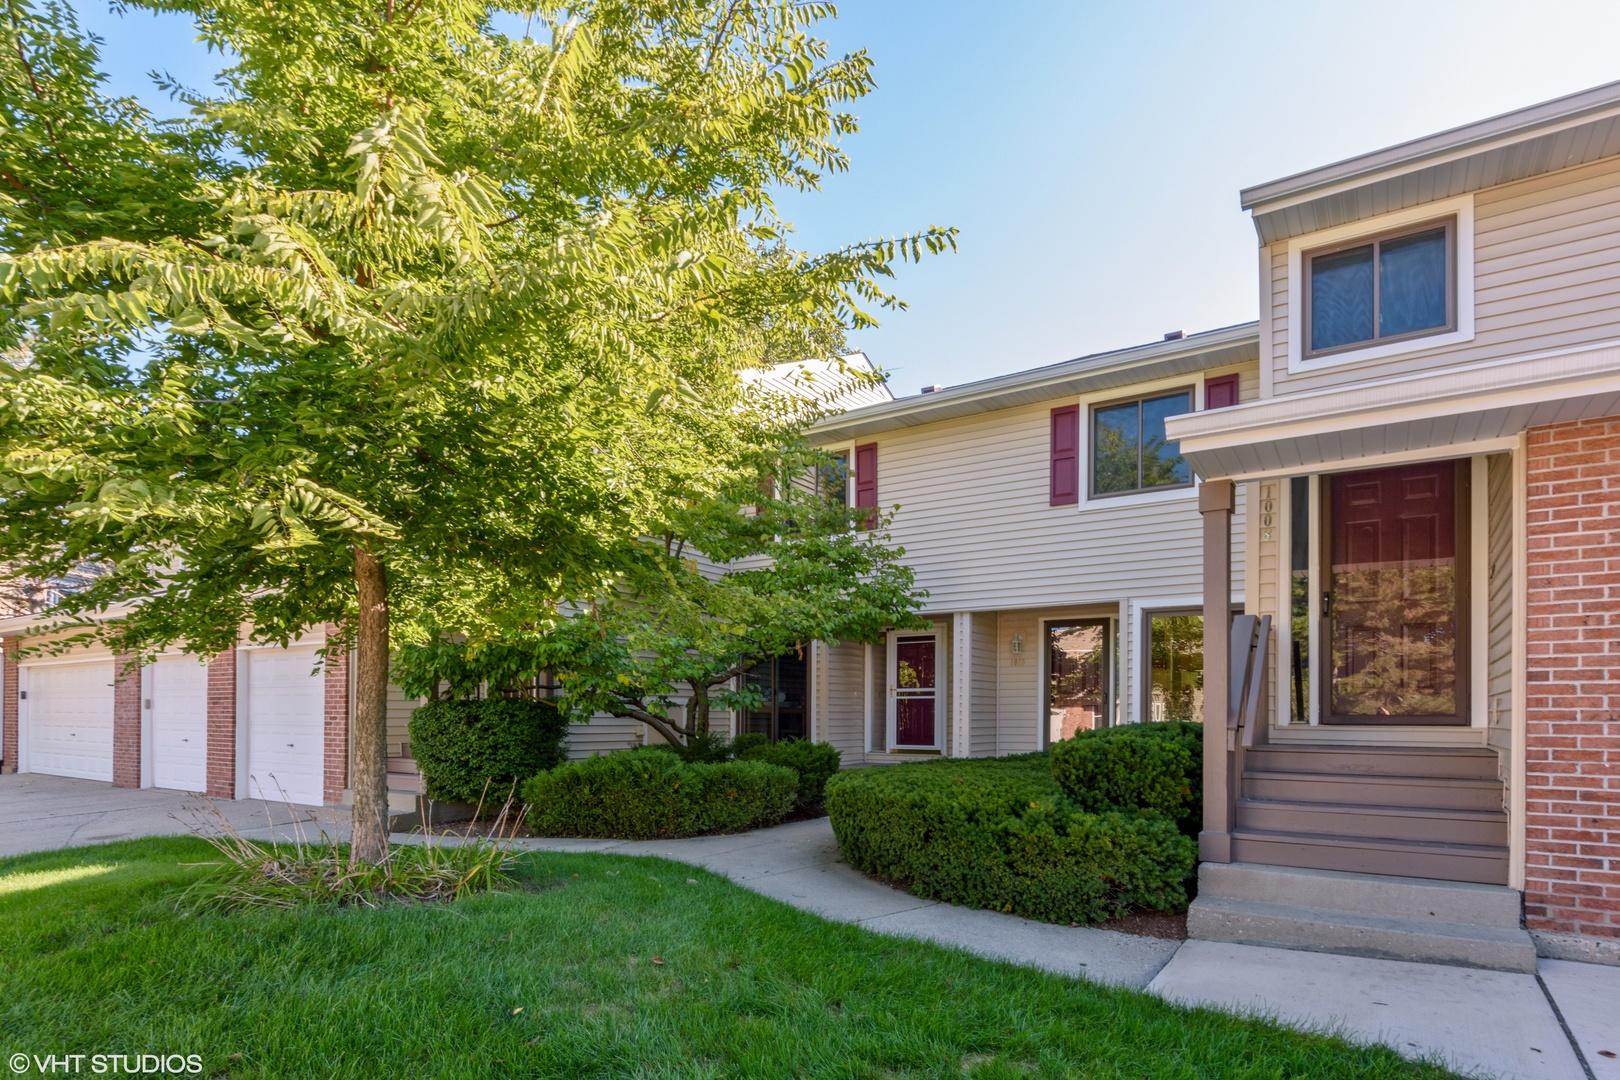 1008 Pinetree Circle, Buffalo Grove, Illinois 60089